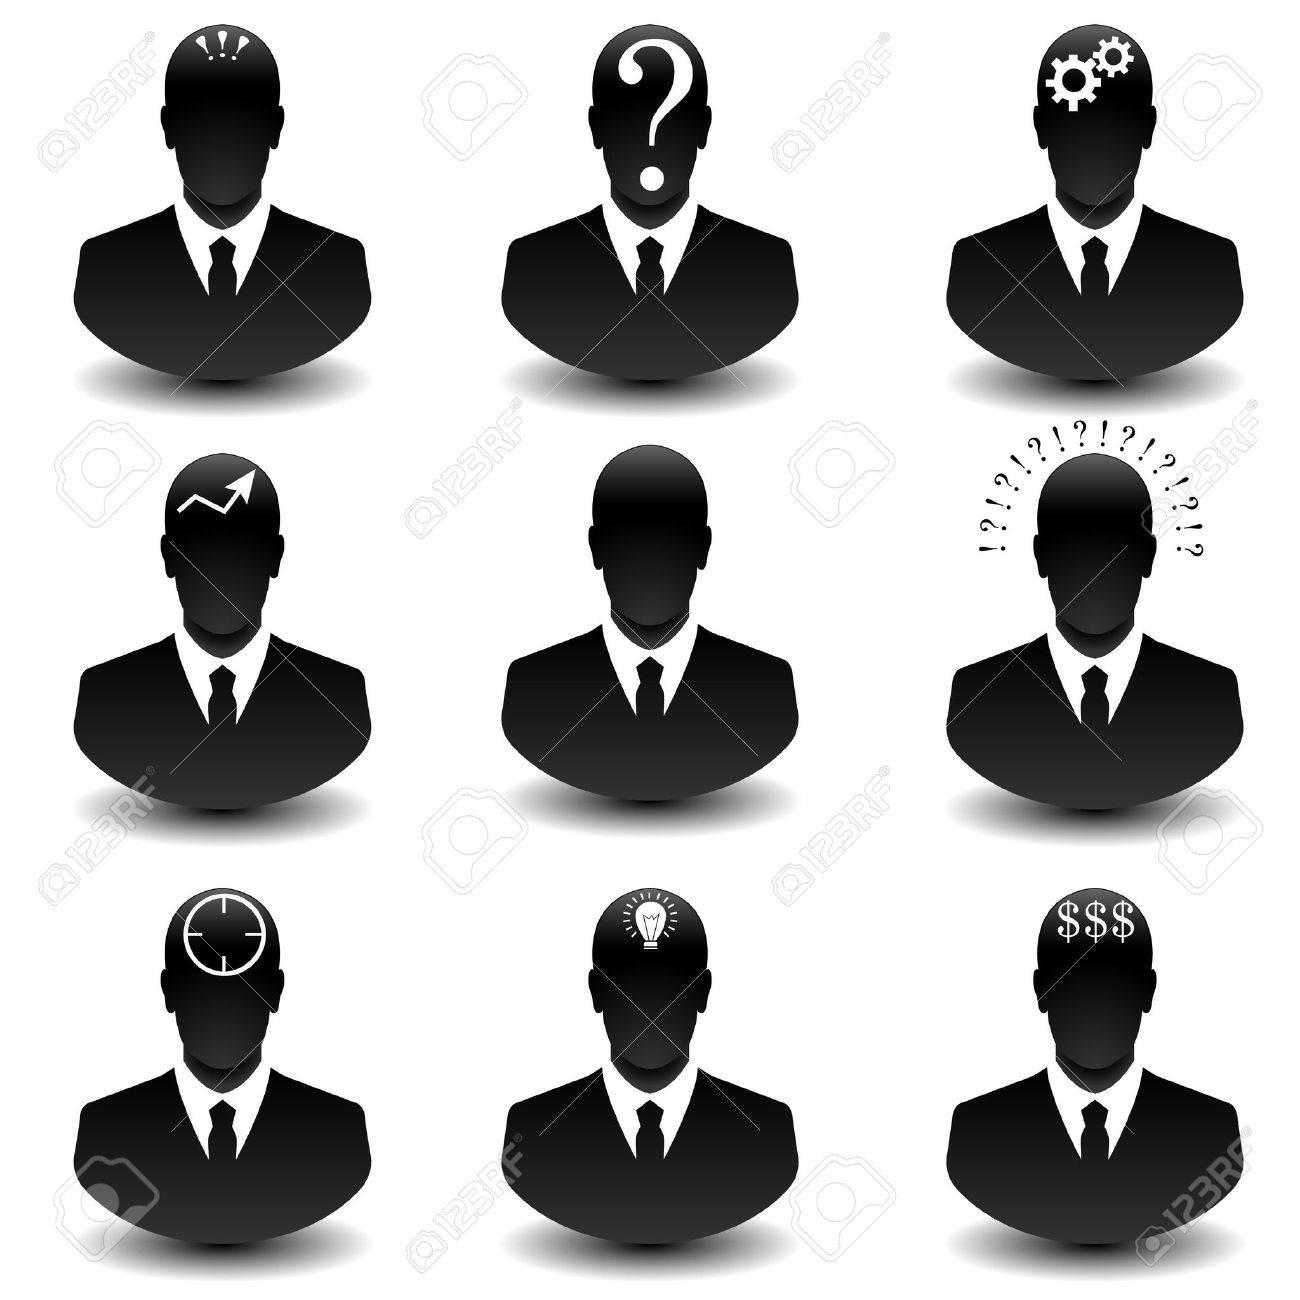 Set of thinking businessman web icon royalty free cliparts set of thinking businessman web icon stock vector 30579386 biocorpaavc